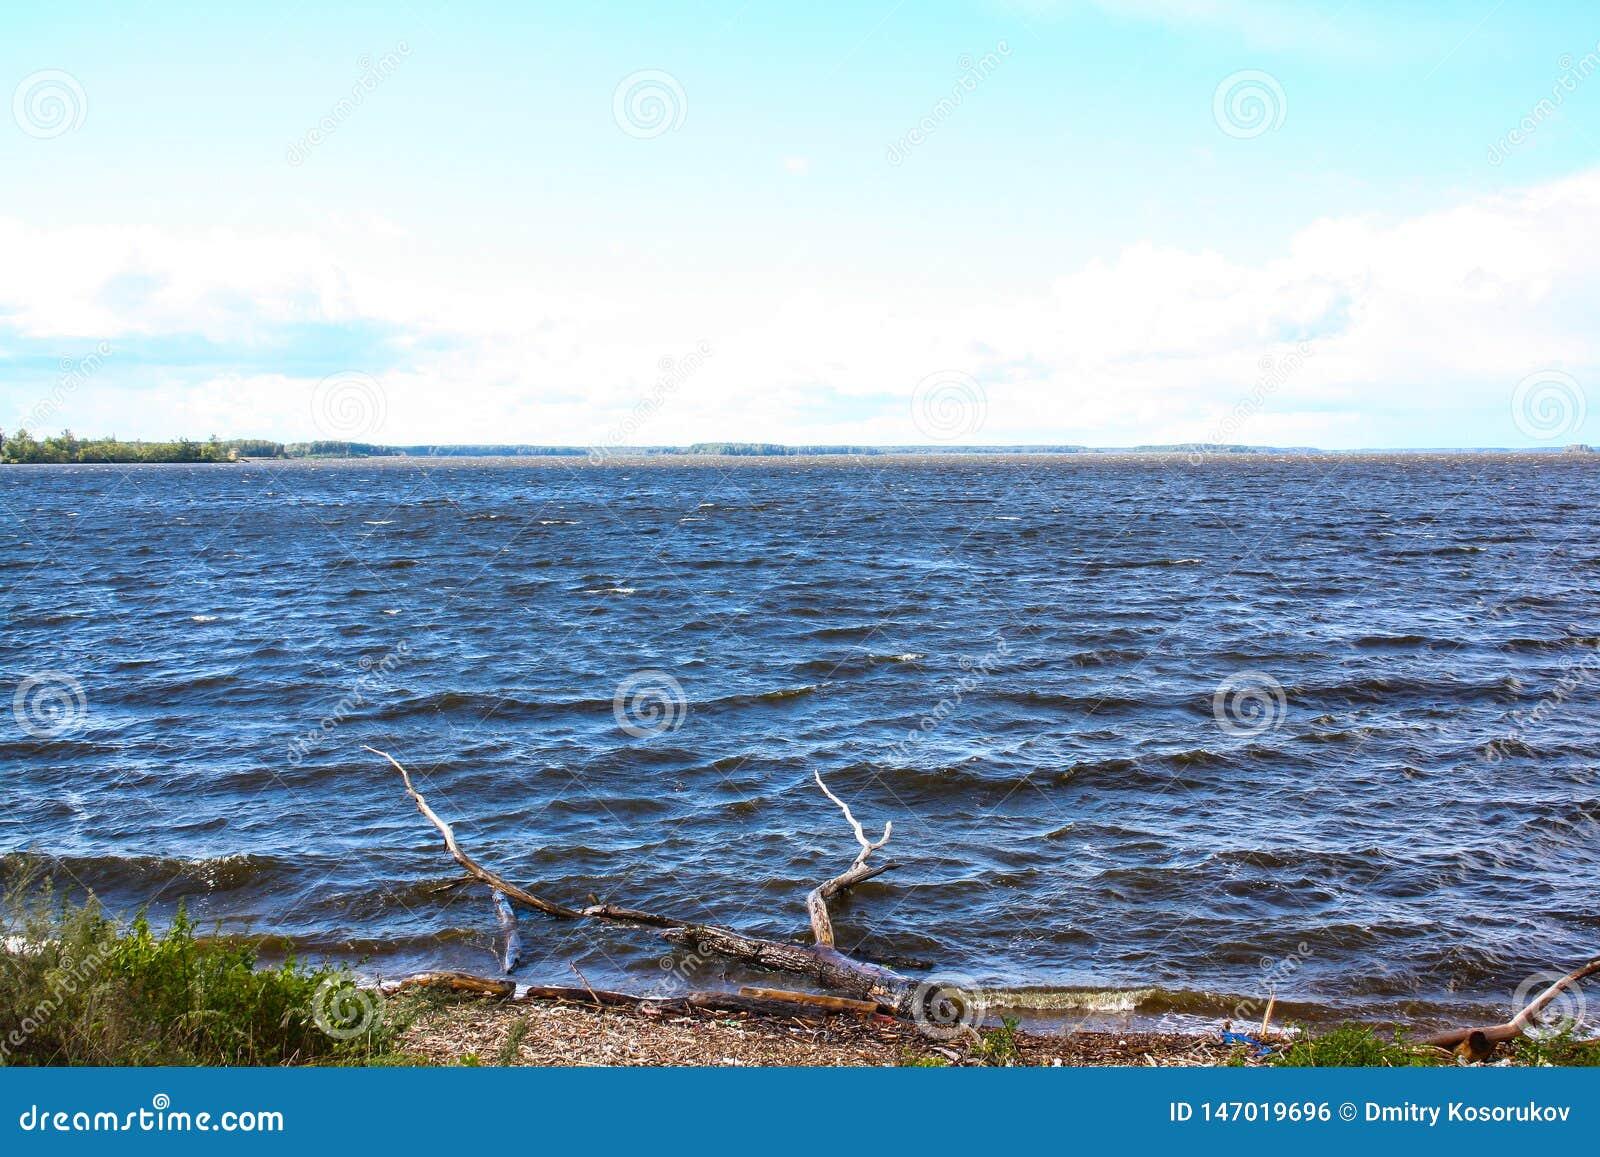 Wide river against blue sky